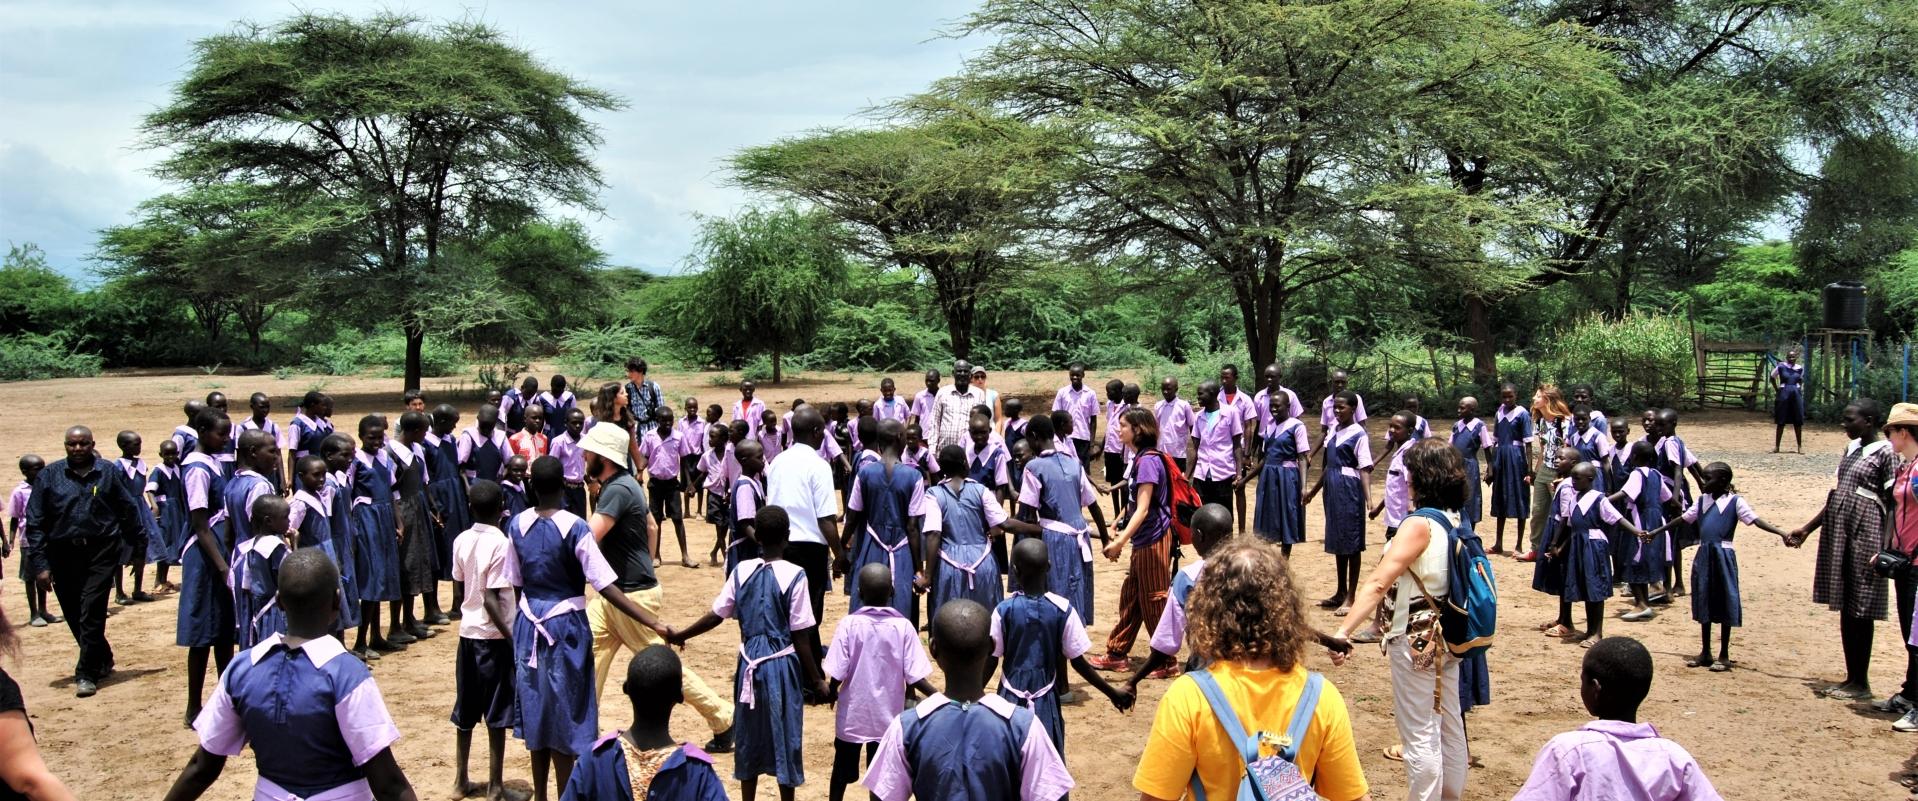 bambini scuola girotondo Kenya Mani Tese 2017